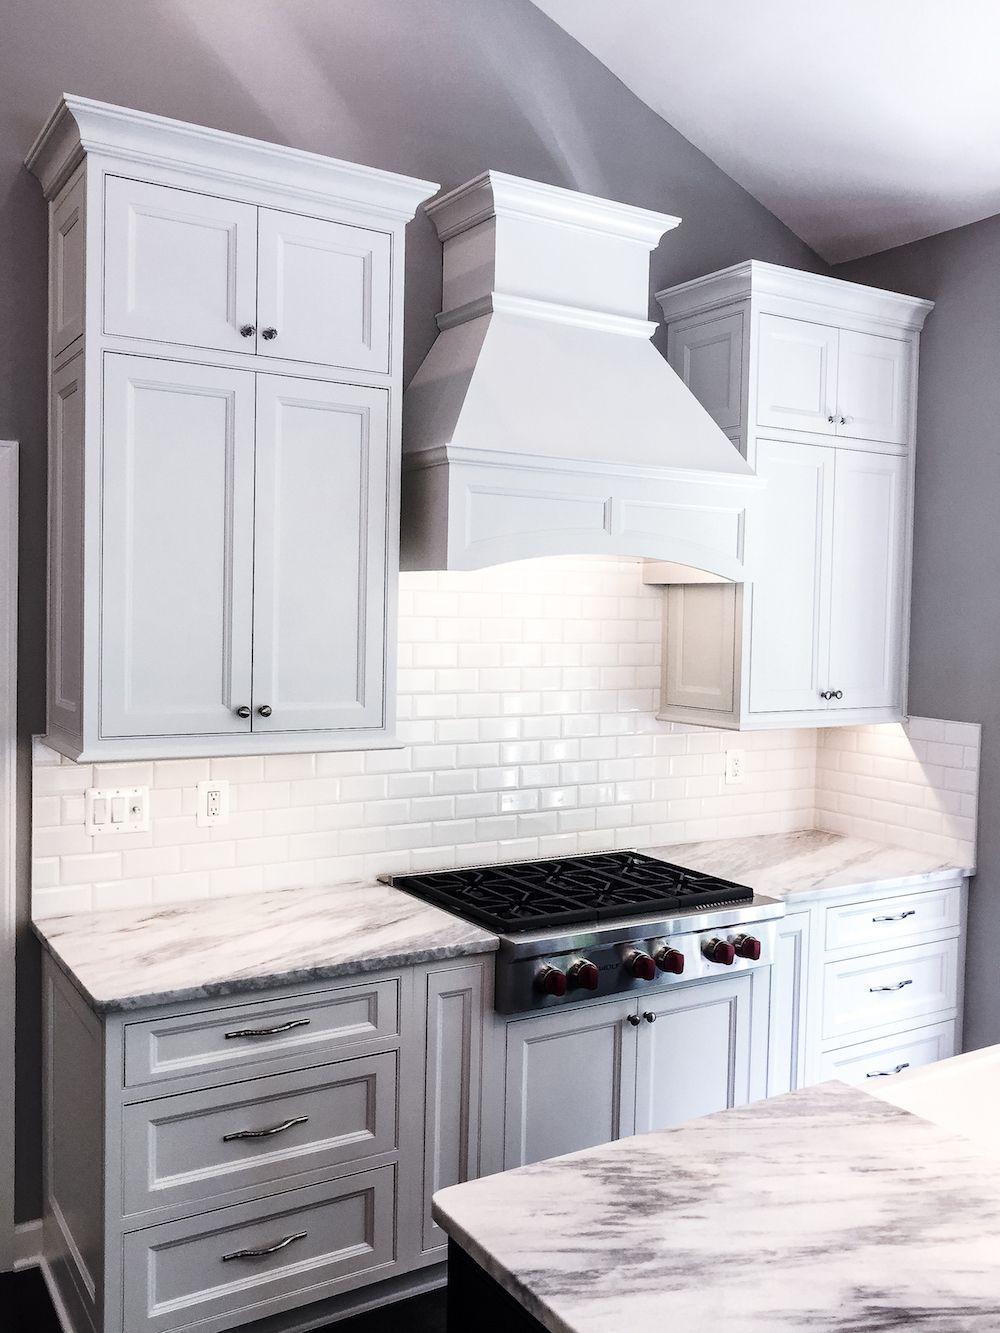 Kitchen Remodels | Kitchen, Kitchen remodel, Remodel